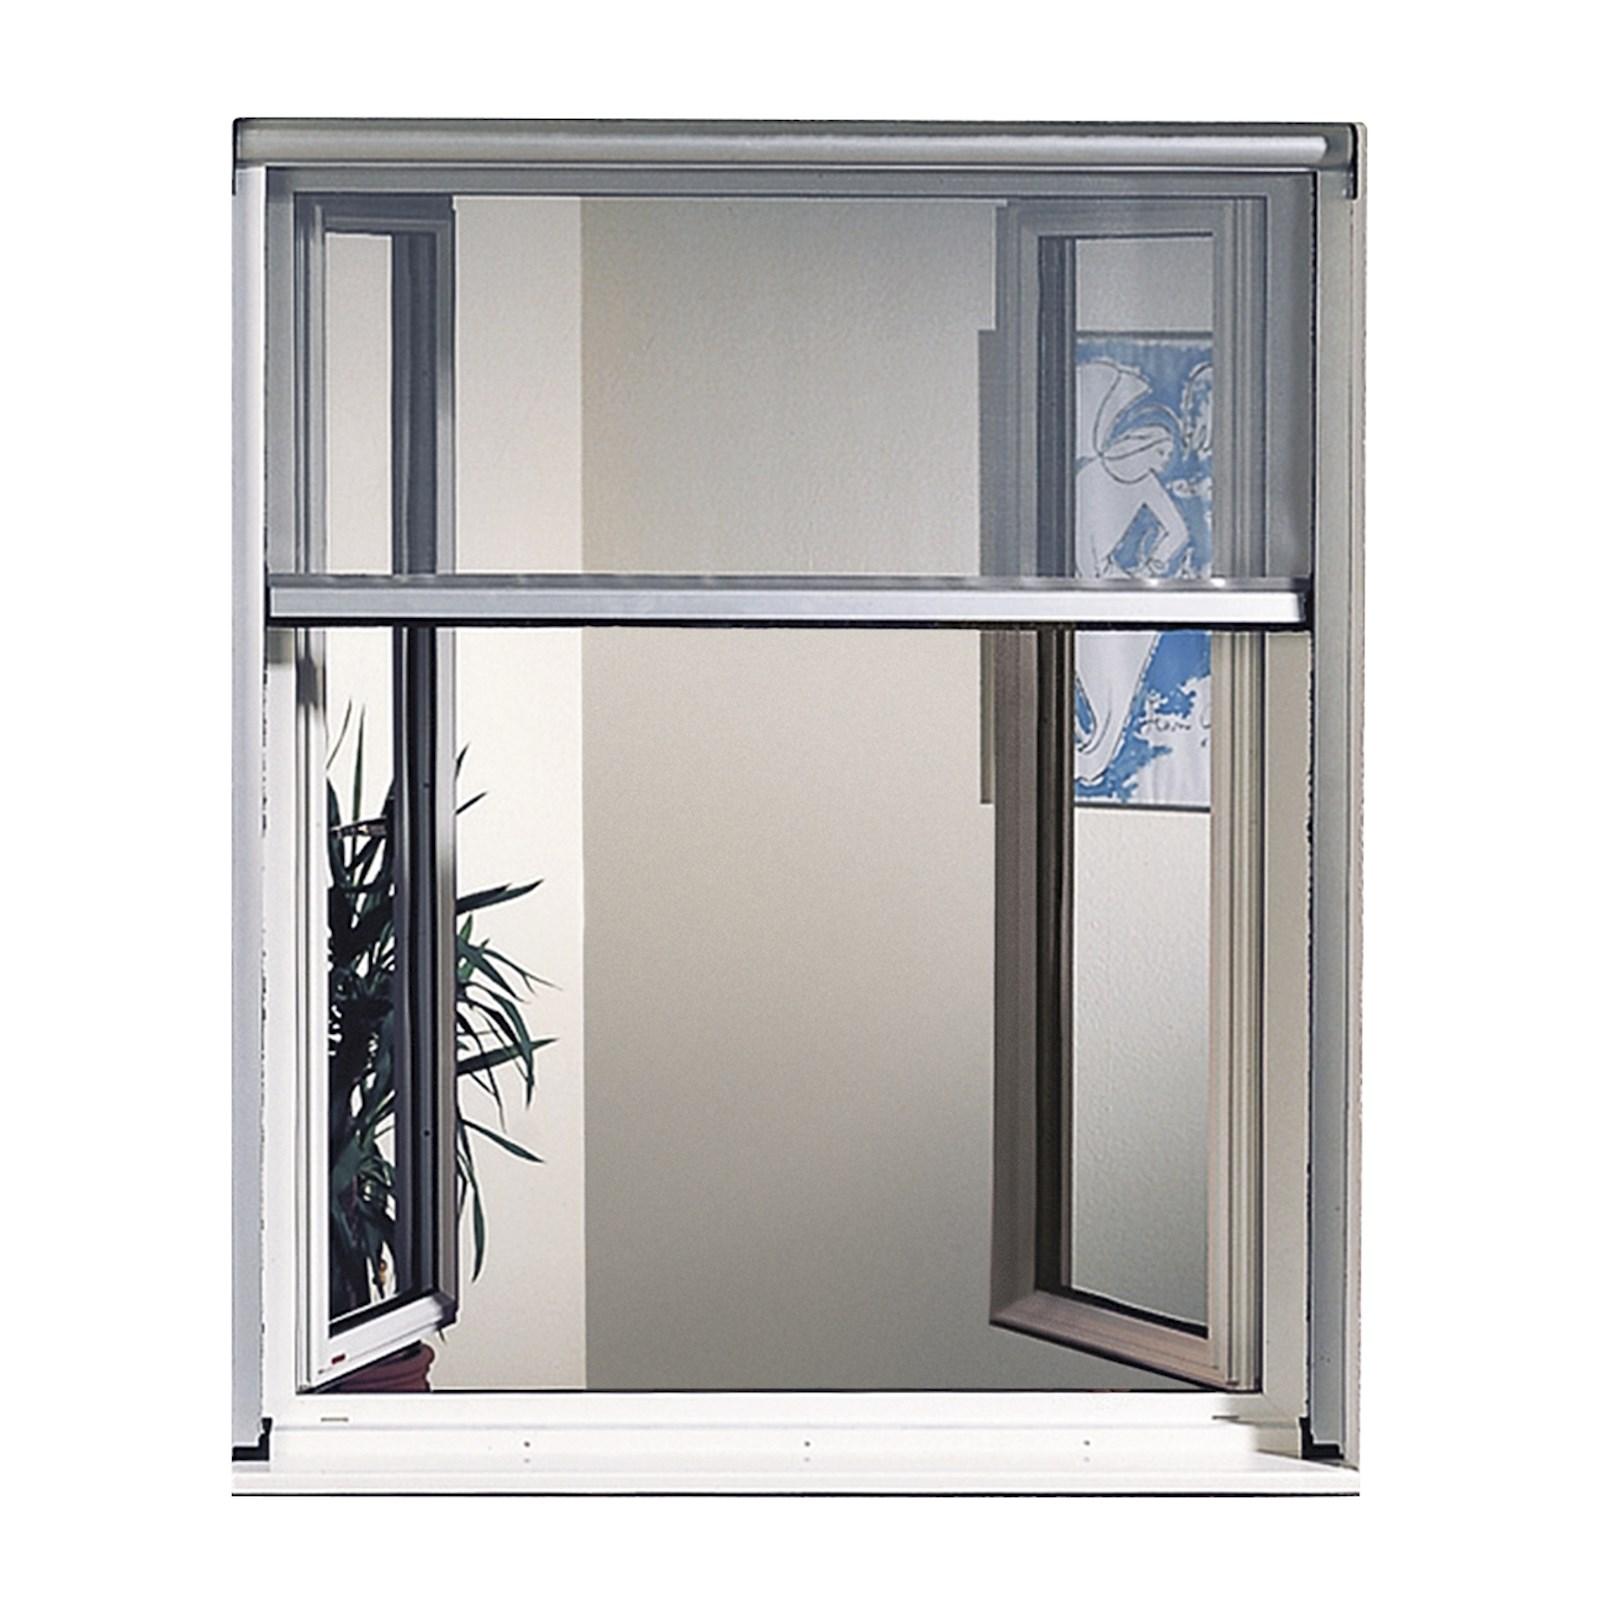 insektenschutz rollo 100 150 cm sch dlingsbek mpfung haushalt landi. Black Bedroom Furniture Sets. Home Design Ideas